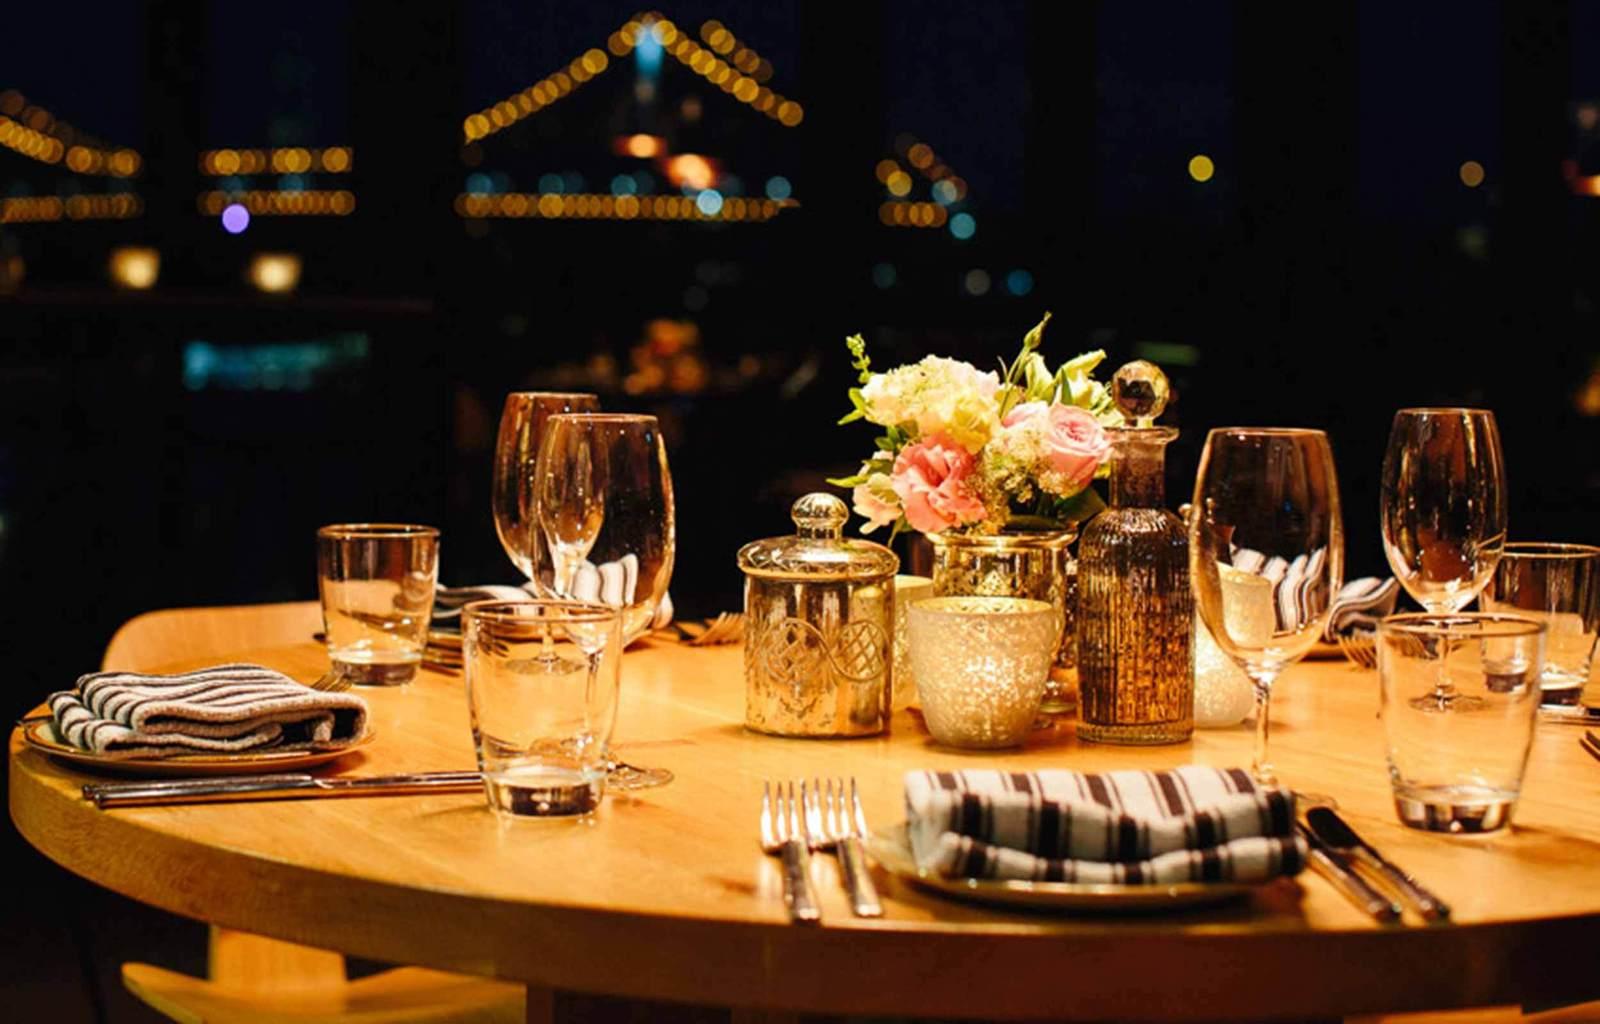 مطاعم بمصر الجديدة